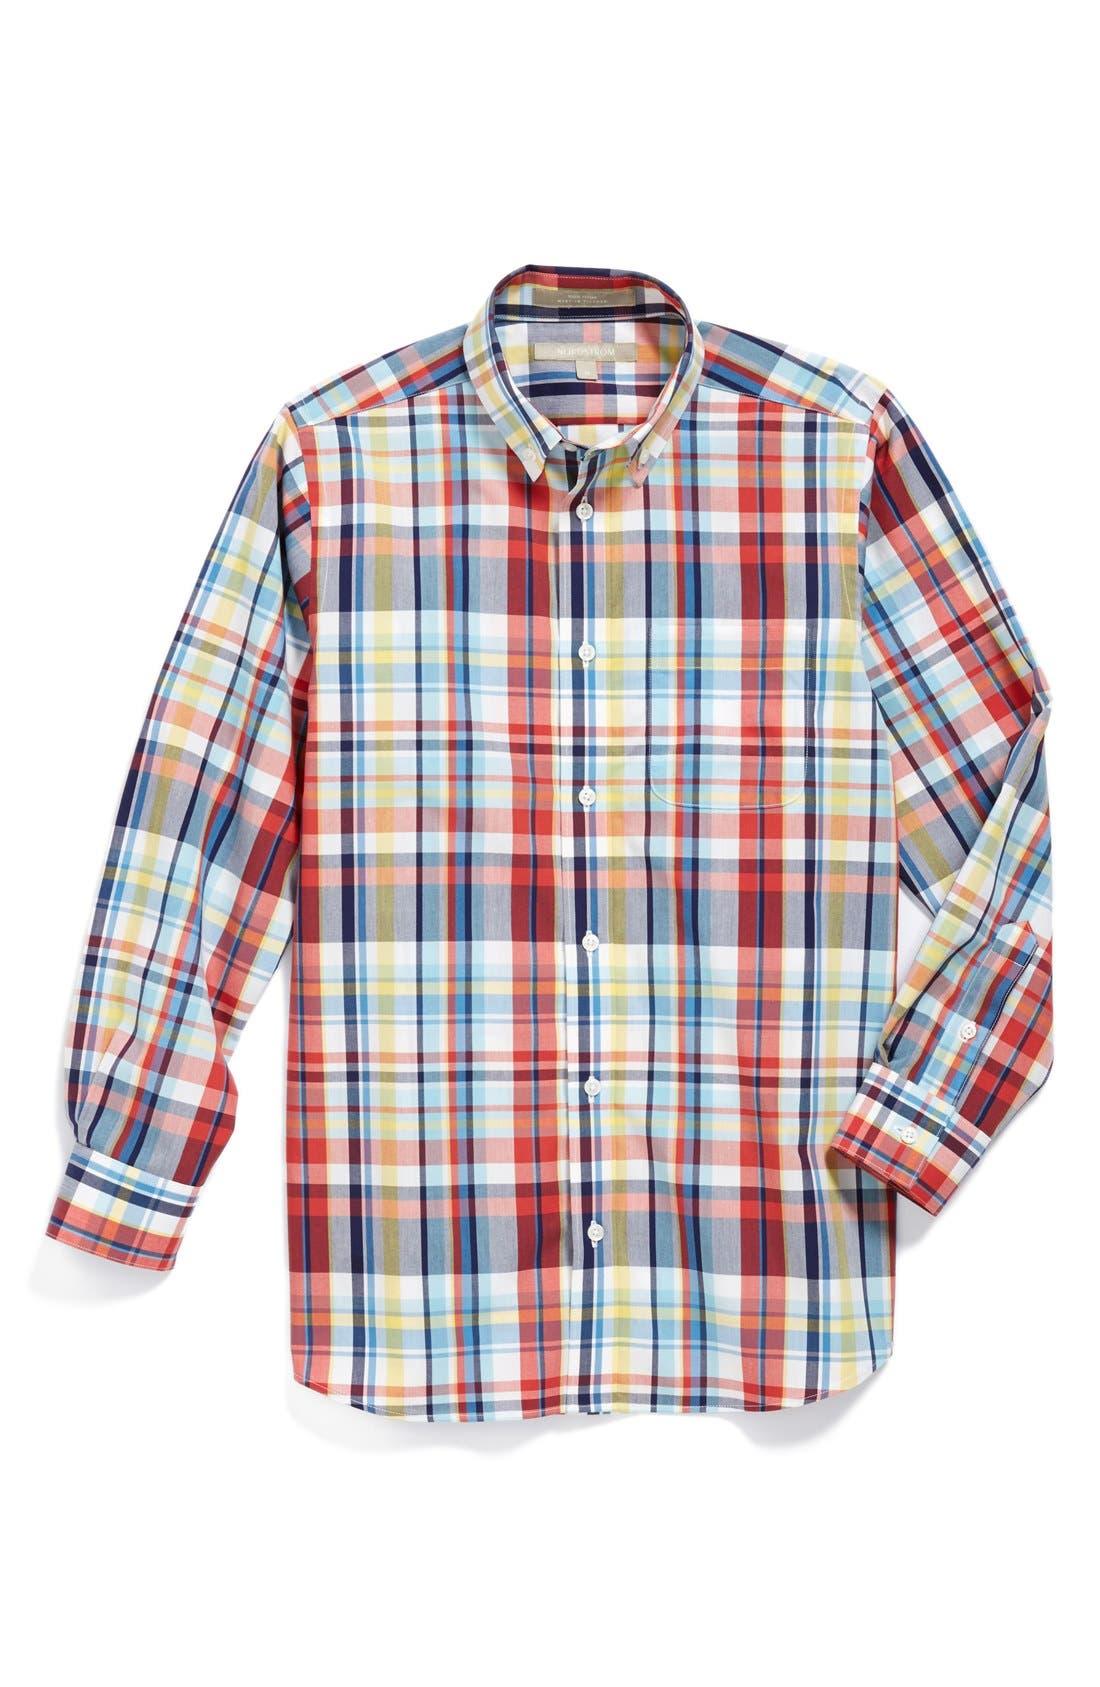 Alternate Image 1 Selected - Nordstrom 'Michael' Plaid Dress Shirt (Big Boys)